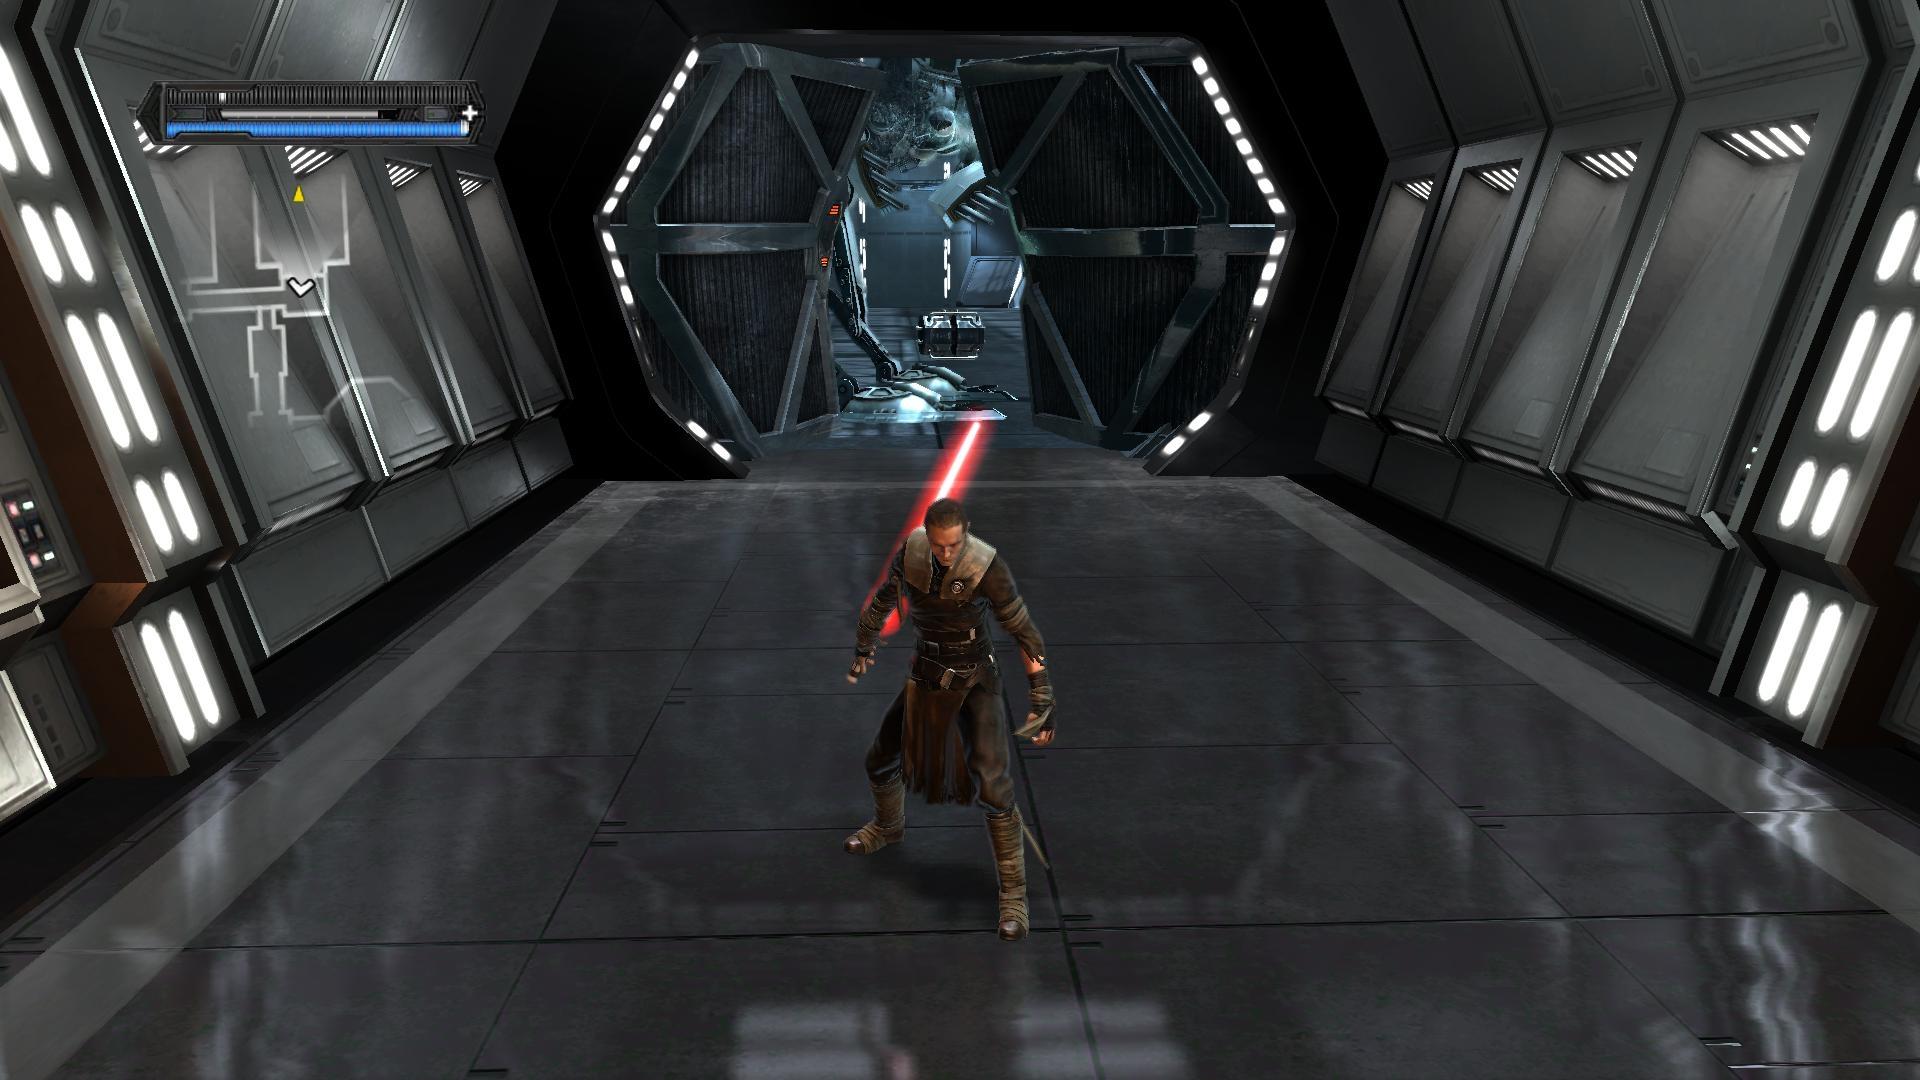 star wars games - HD1920×1080